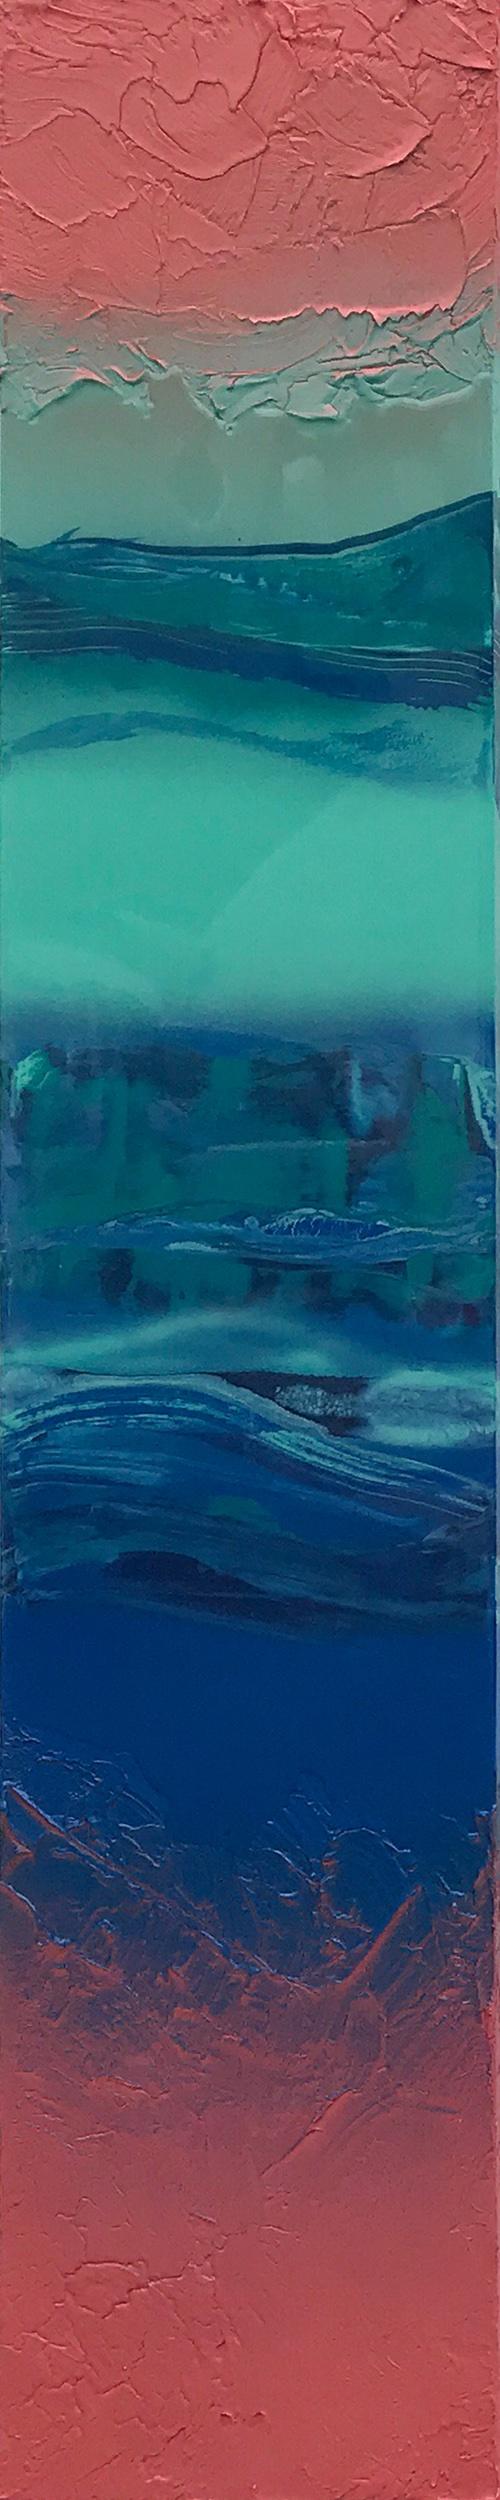 Coral Sands 1.jpeg